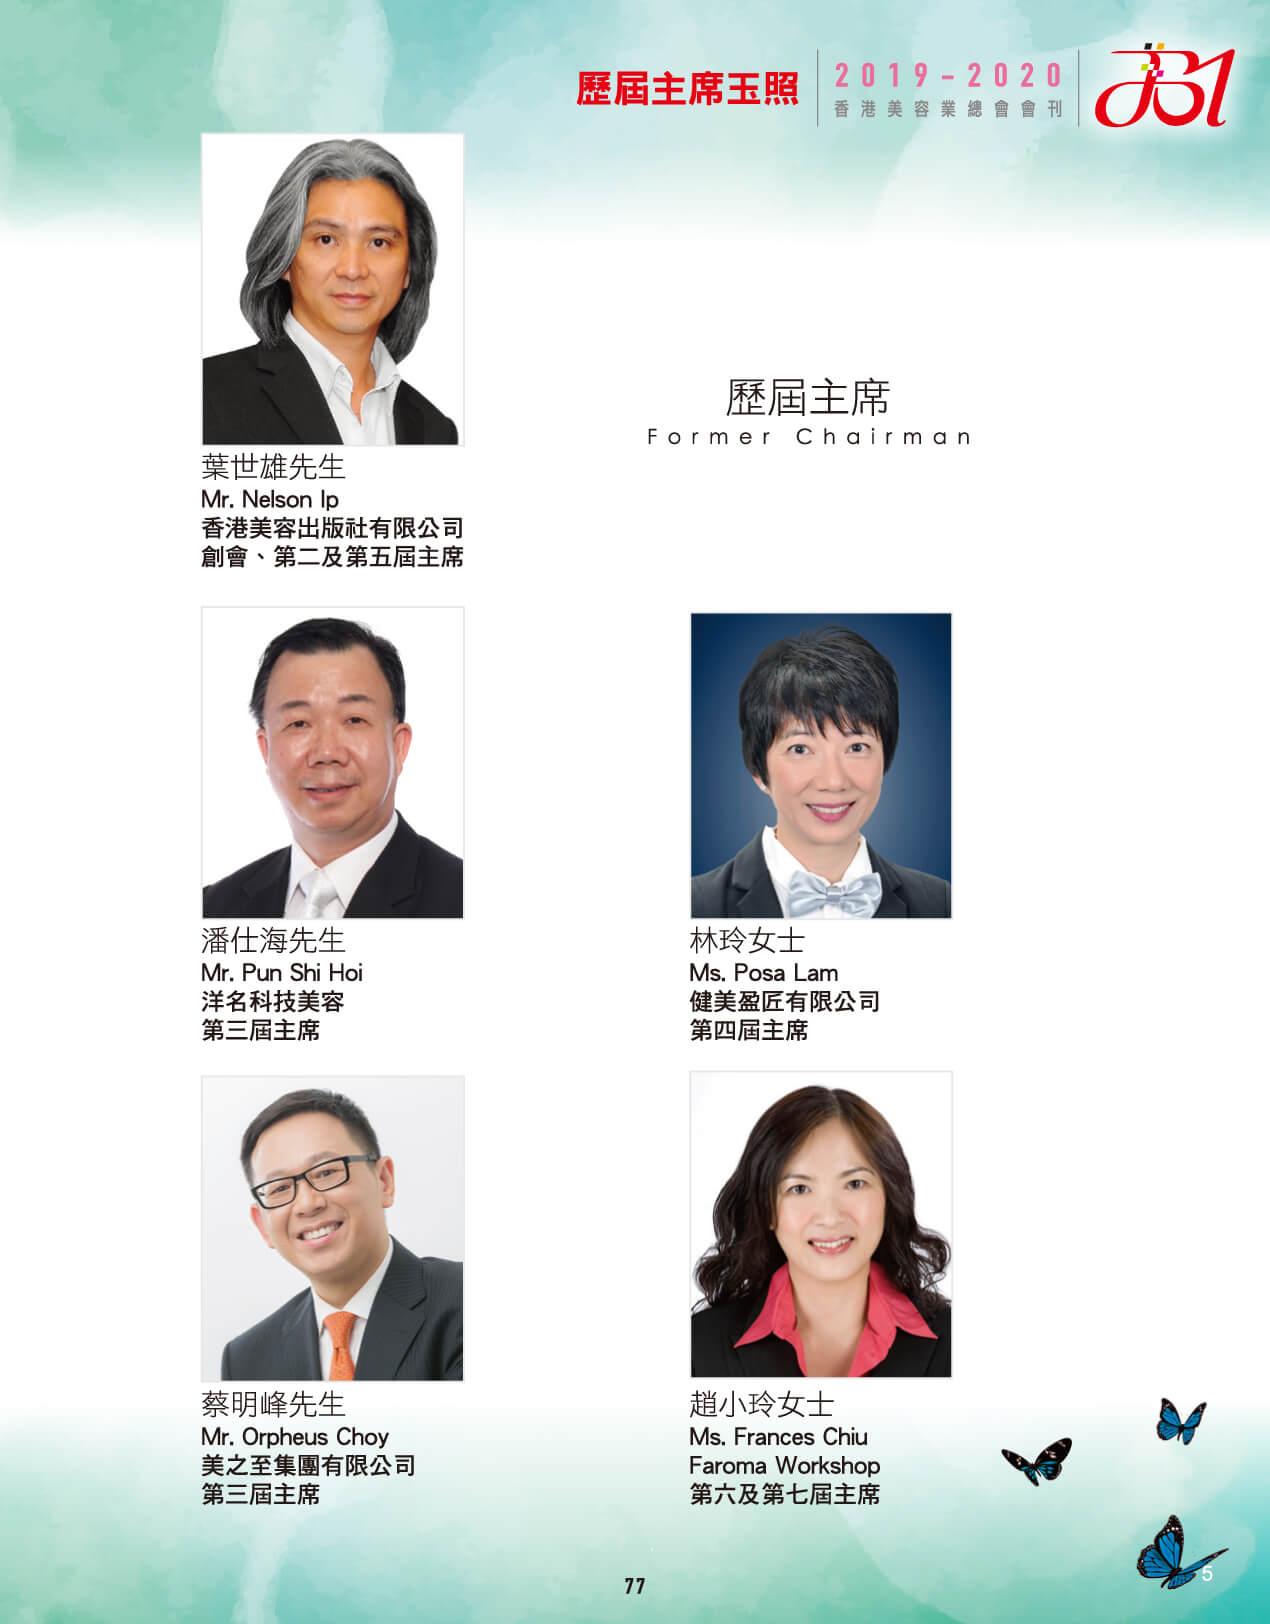 P076-077-2019-2020-FBi-Chairman-op-2